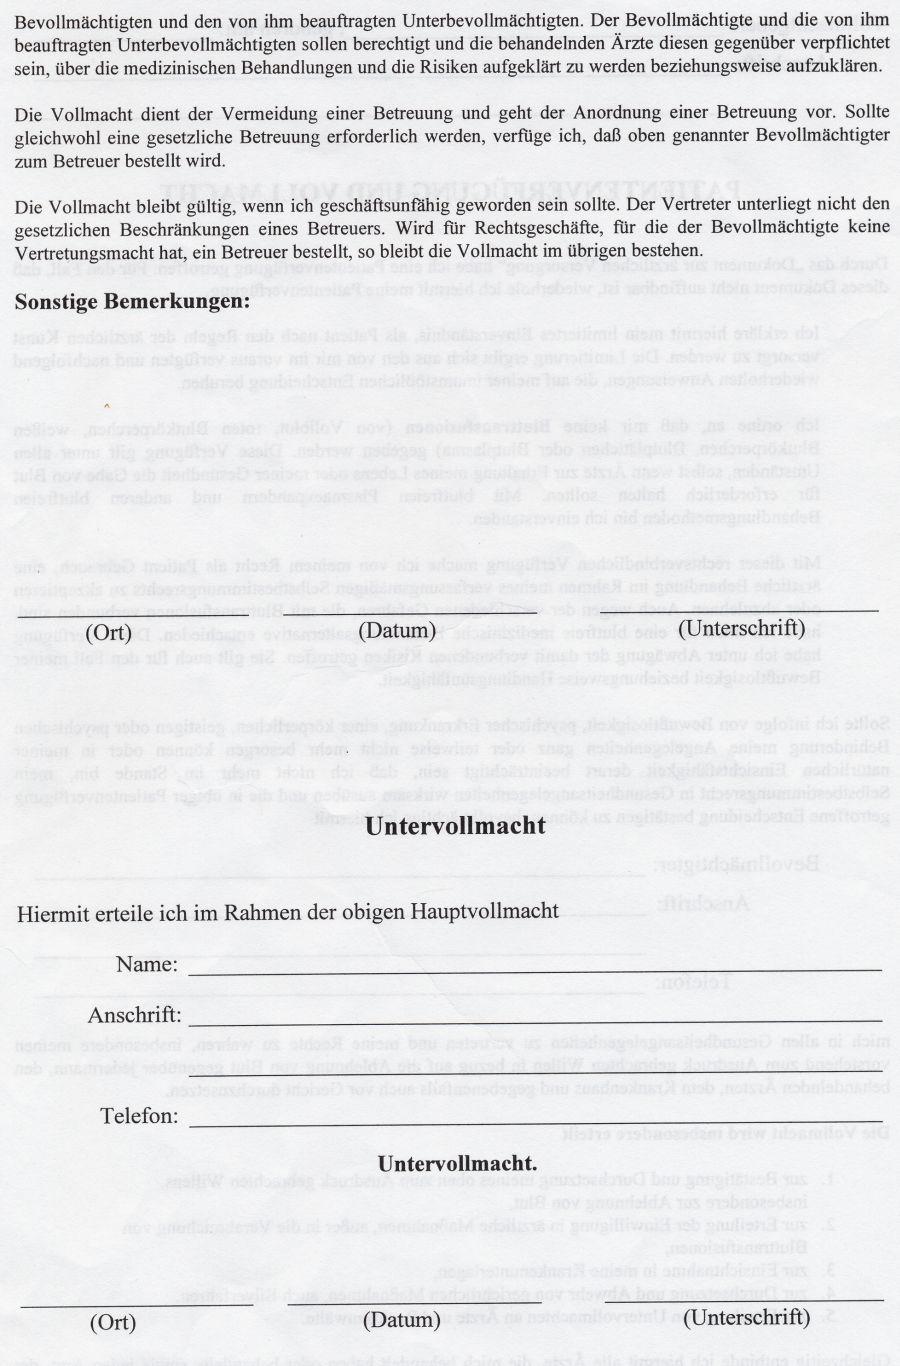 Berühmt Blank Vollmachtsformular Ideen - FORTSETZUNG ARBEITSBLATT ...